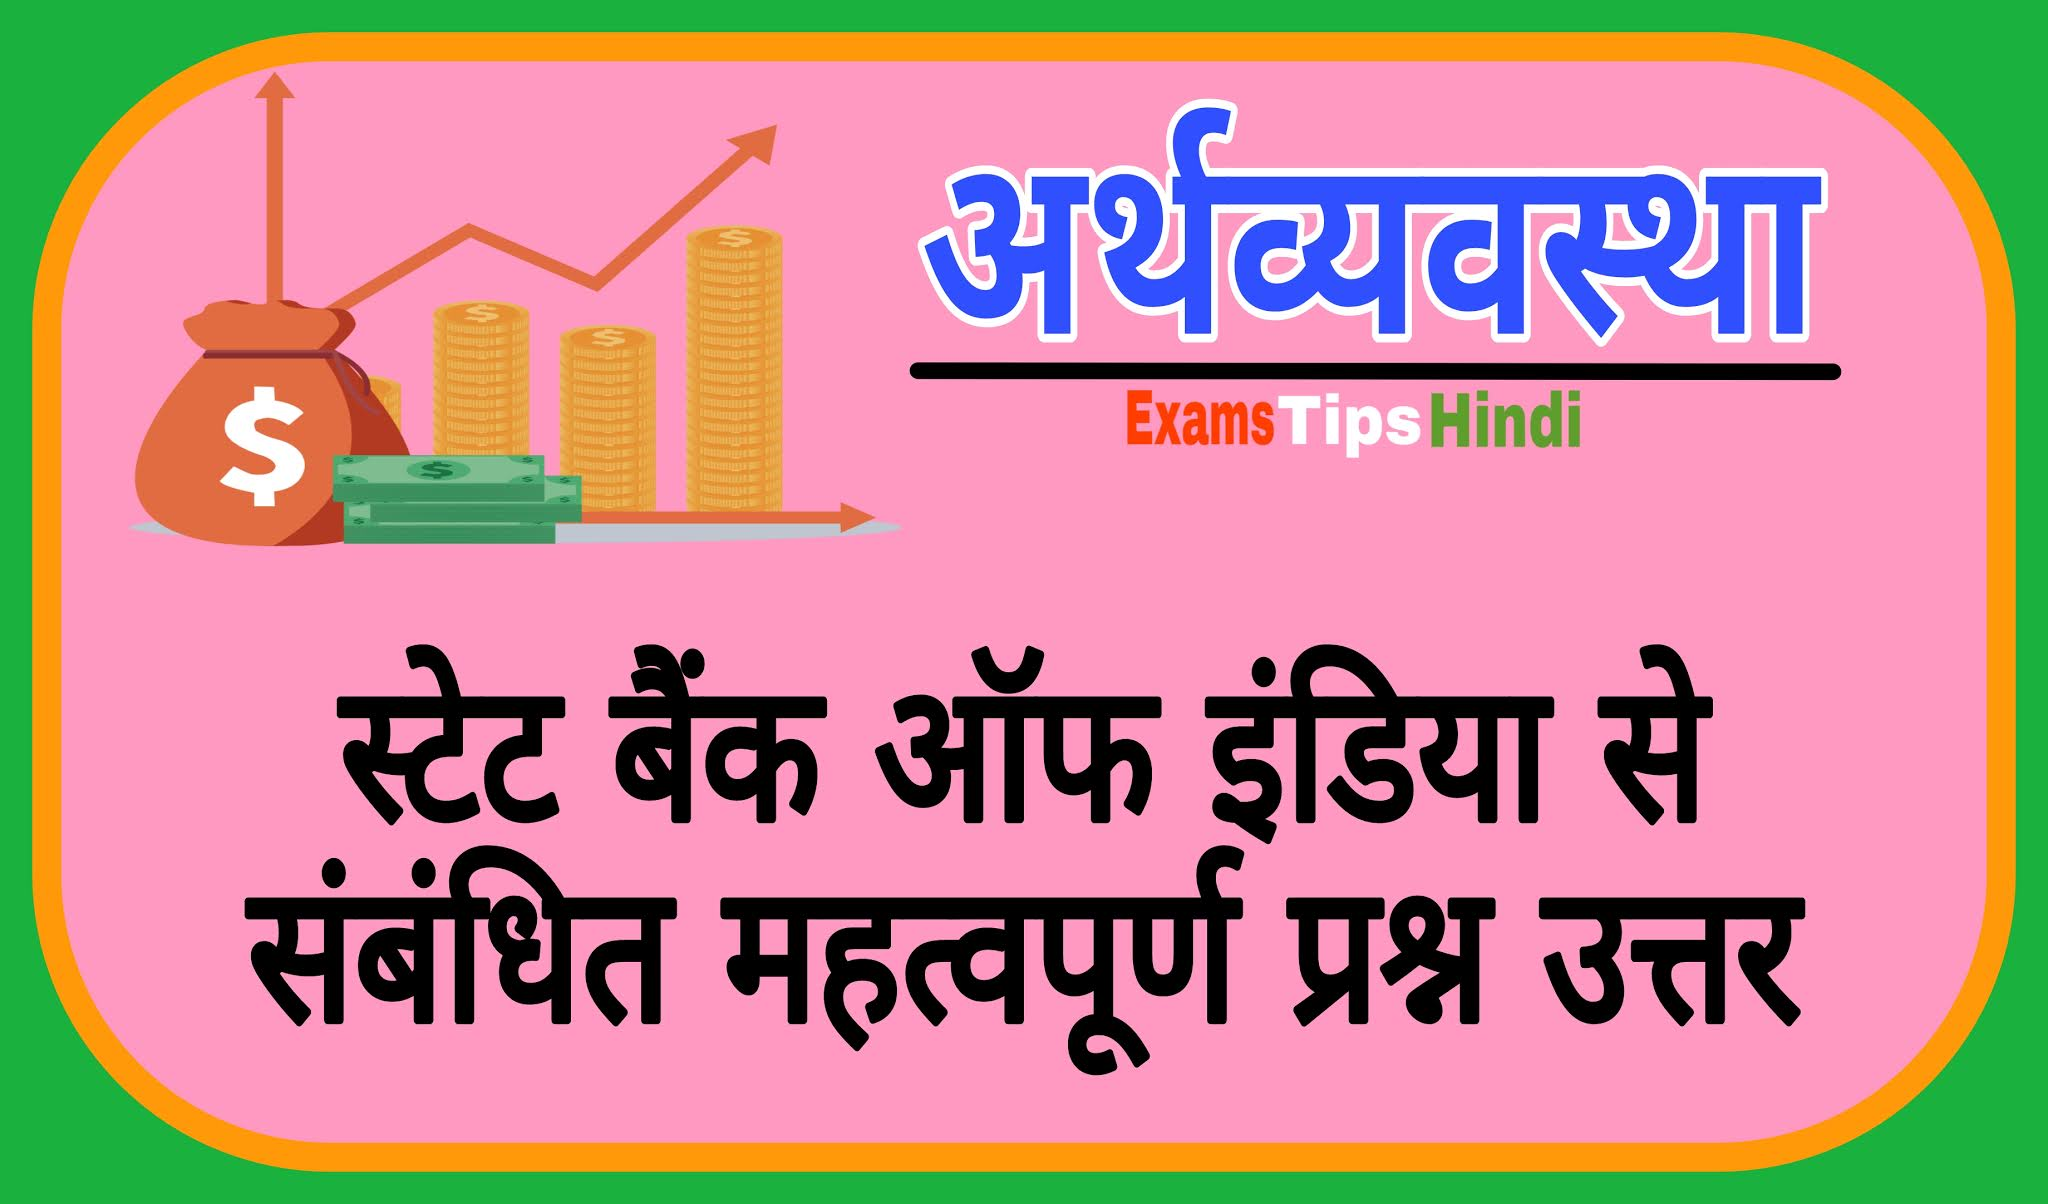 स्टेट बैंक ऑफ इंडिया संबंधित जानकारी, स्टेट बैंक ऑफ इंडिया संबंधित प्रश्न उत्तर, State Bank of India Question Answer, SBI related question in hindi